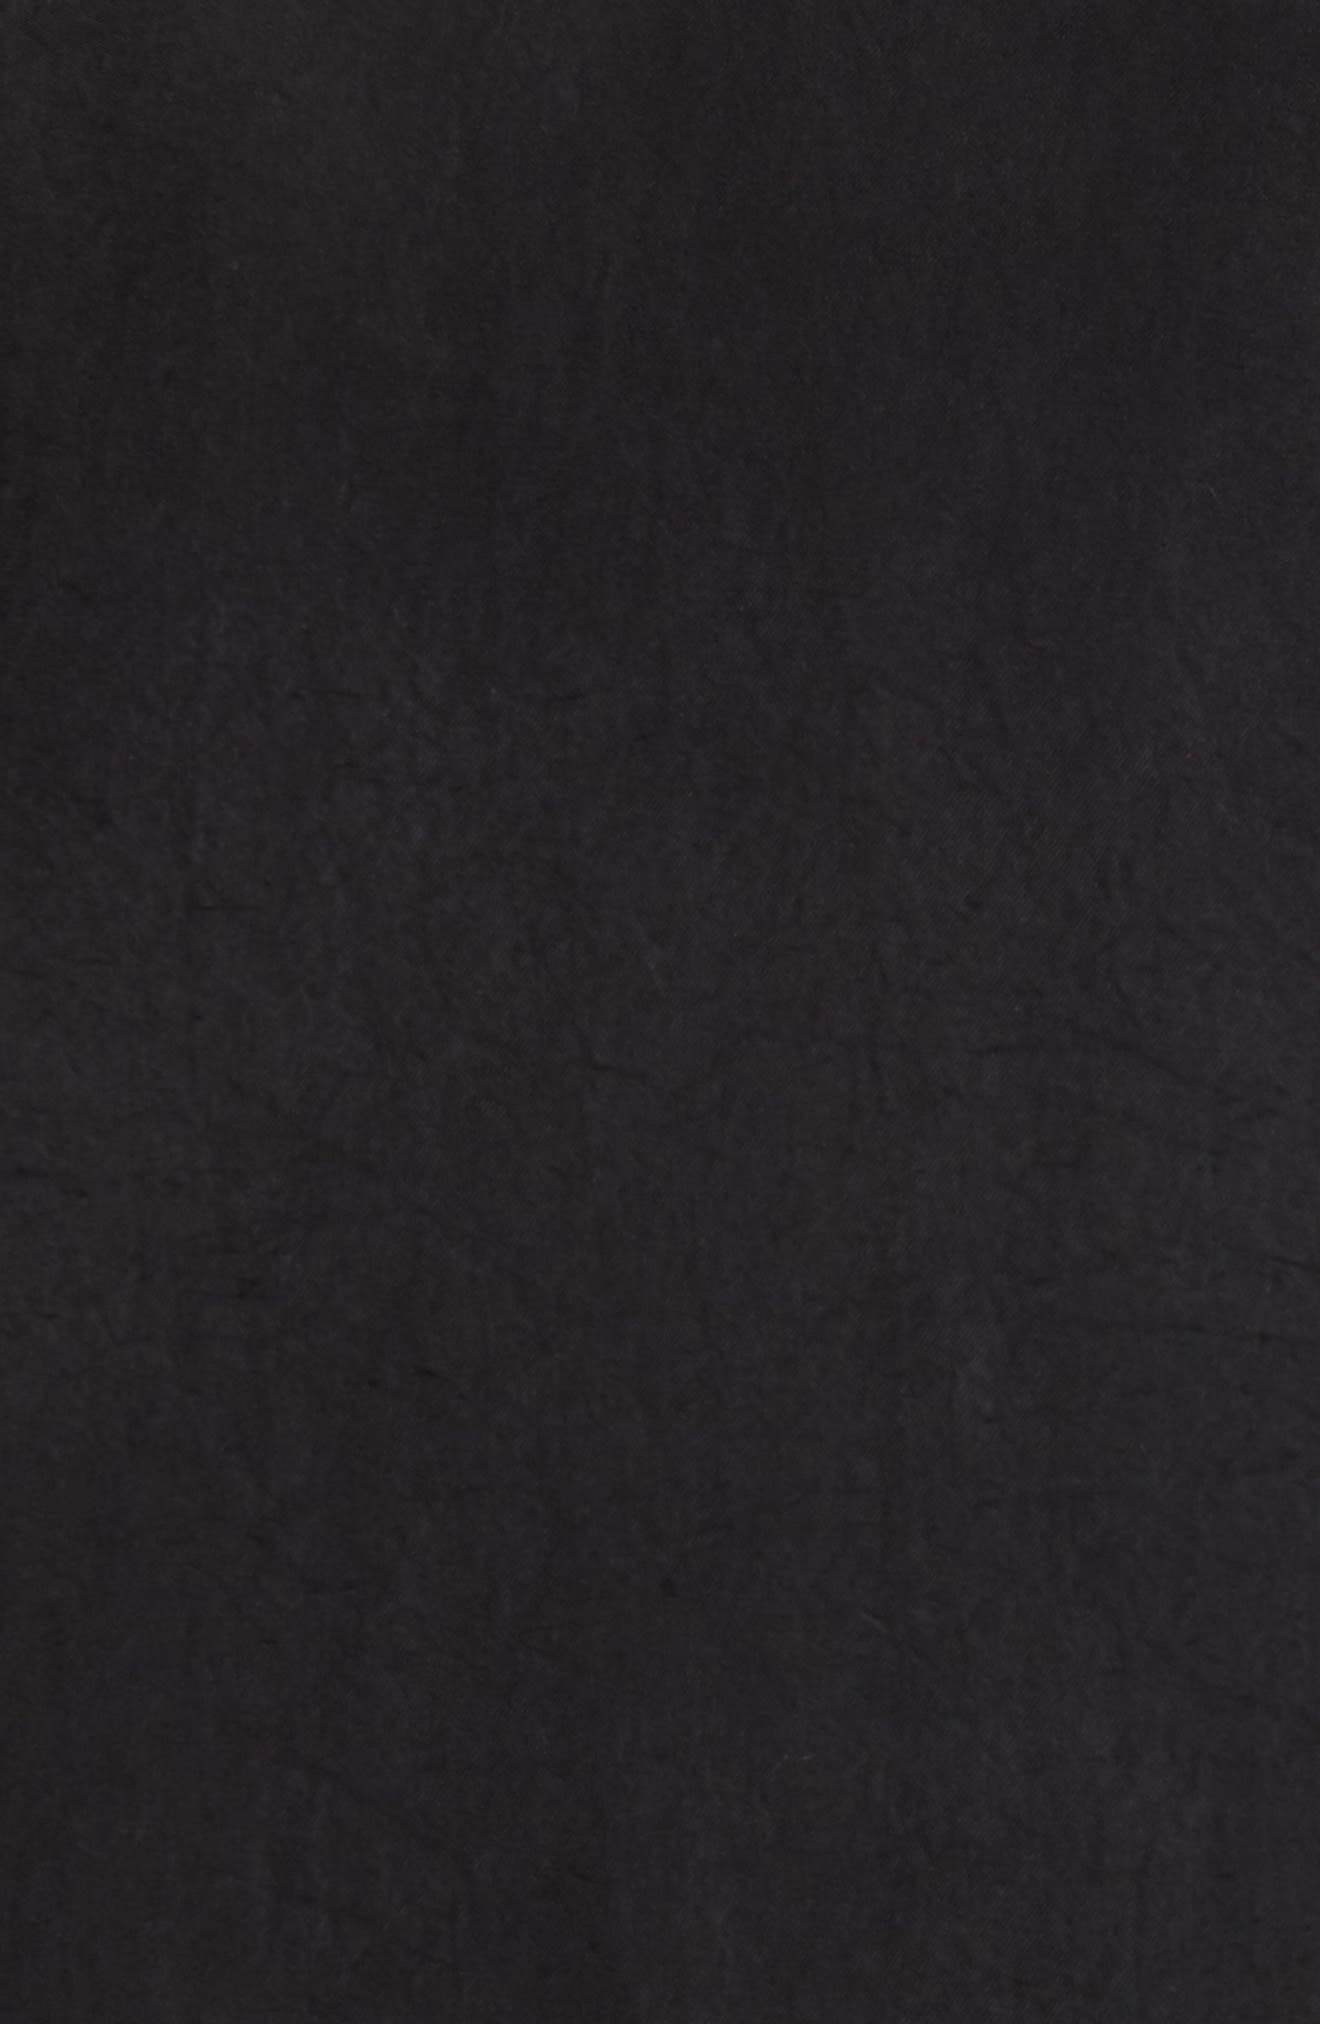 Colorblock Bomber Jacket,                             Alternate thumbnail 5, color,                             Black/ Mechanic Blue